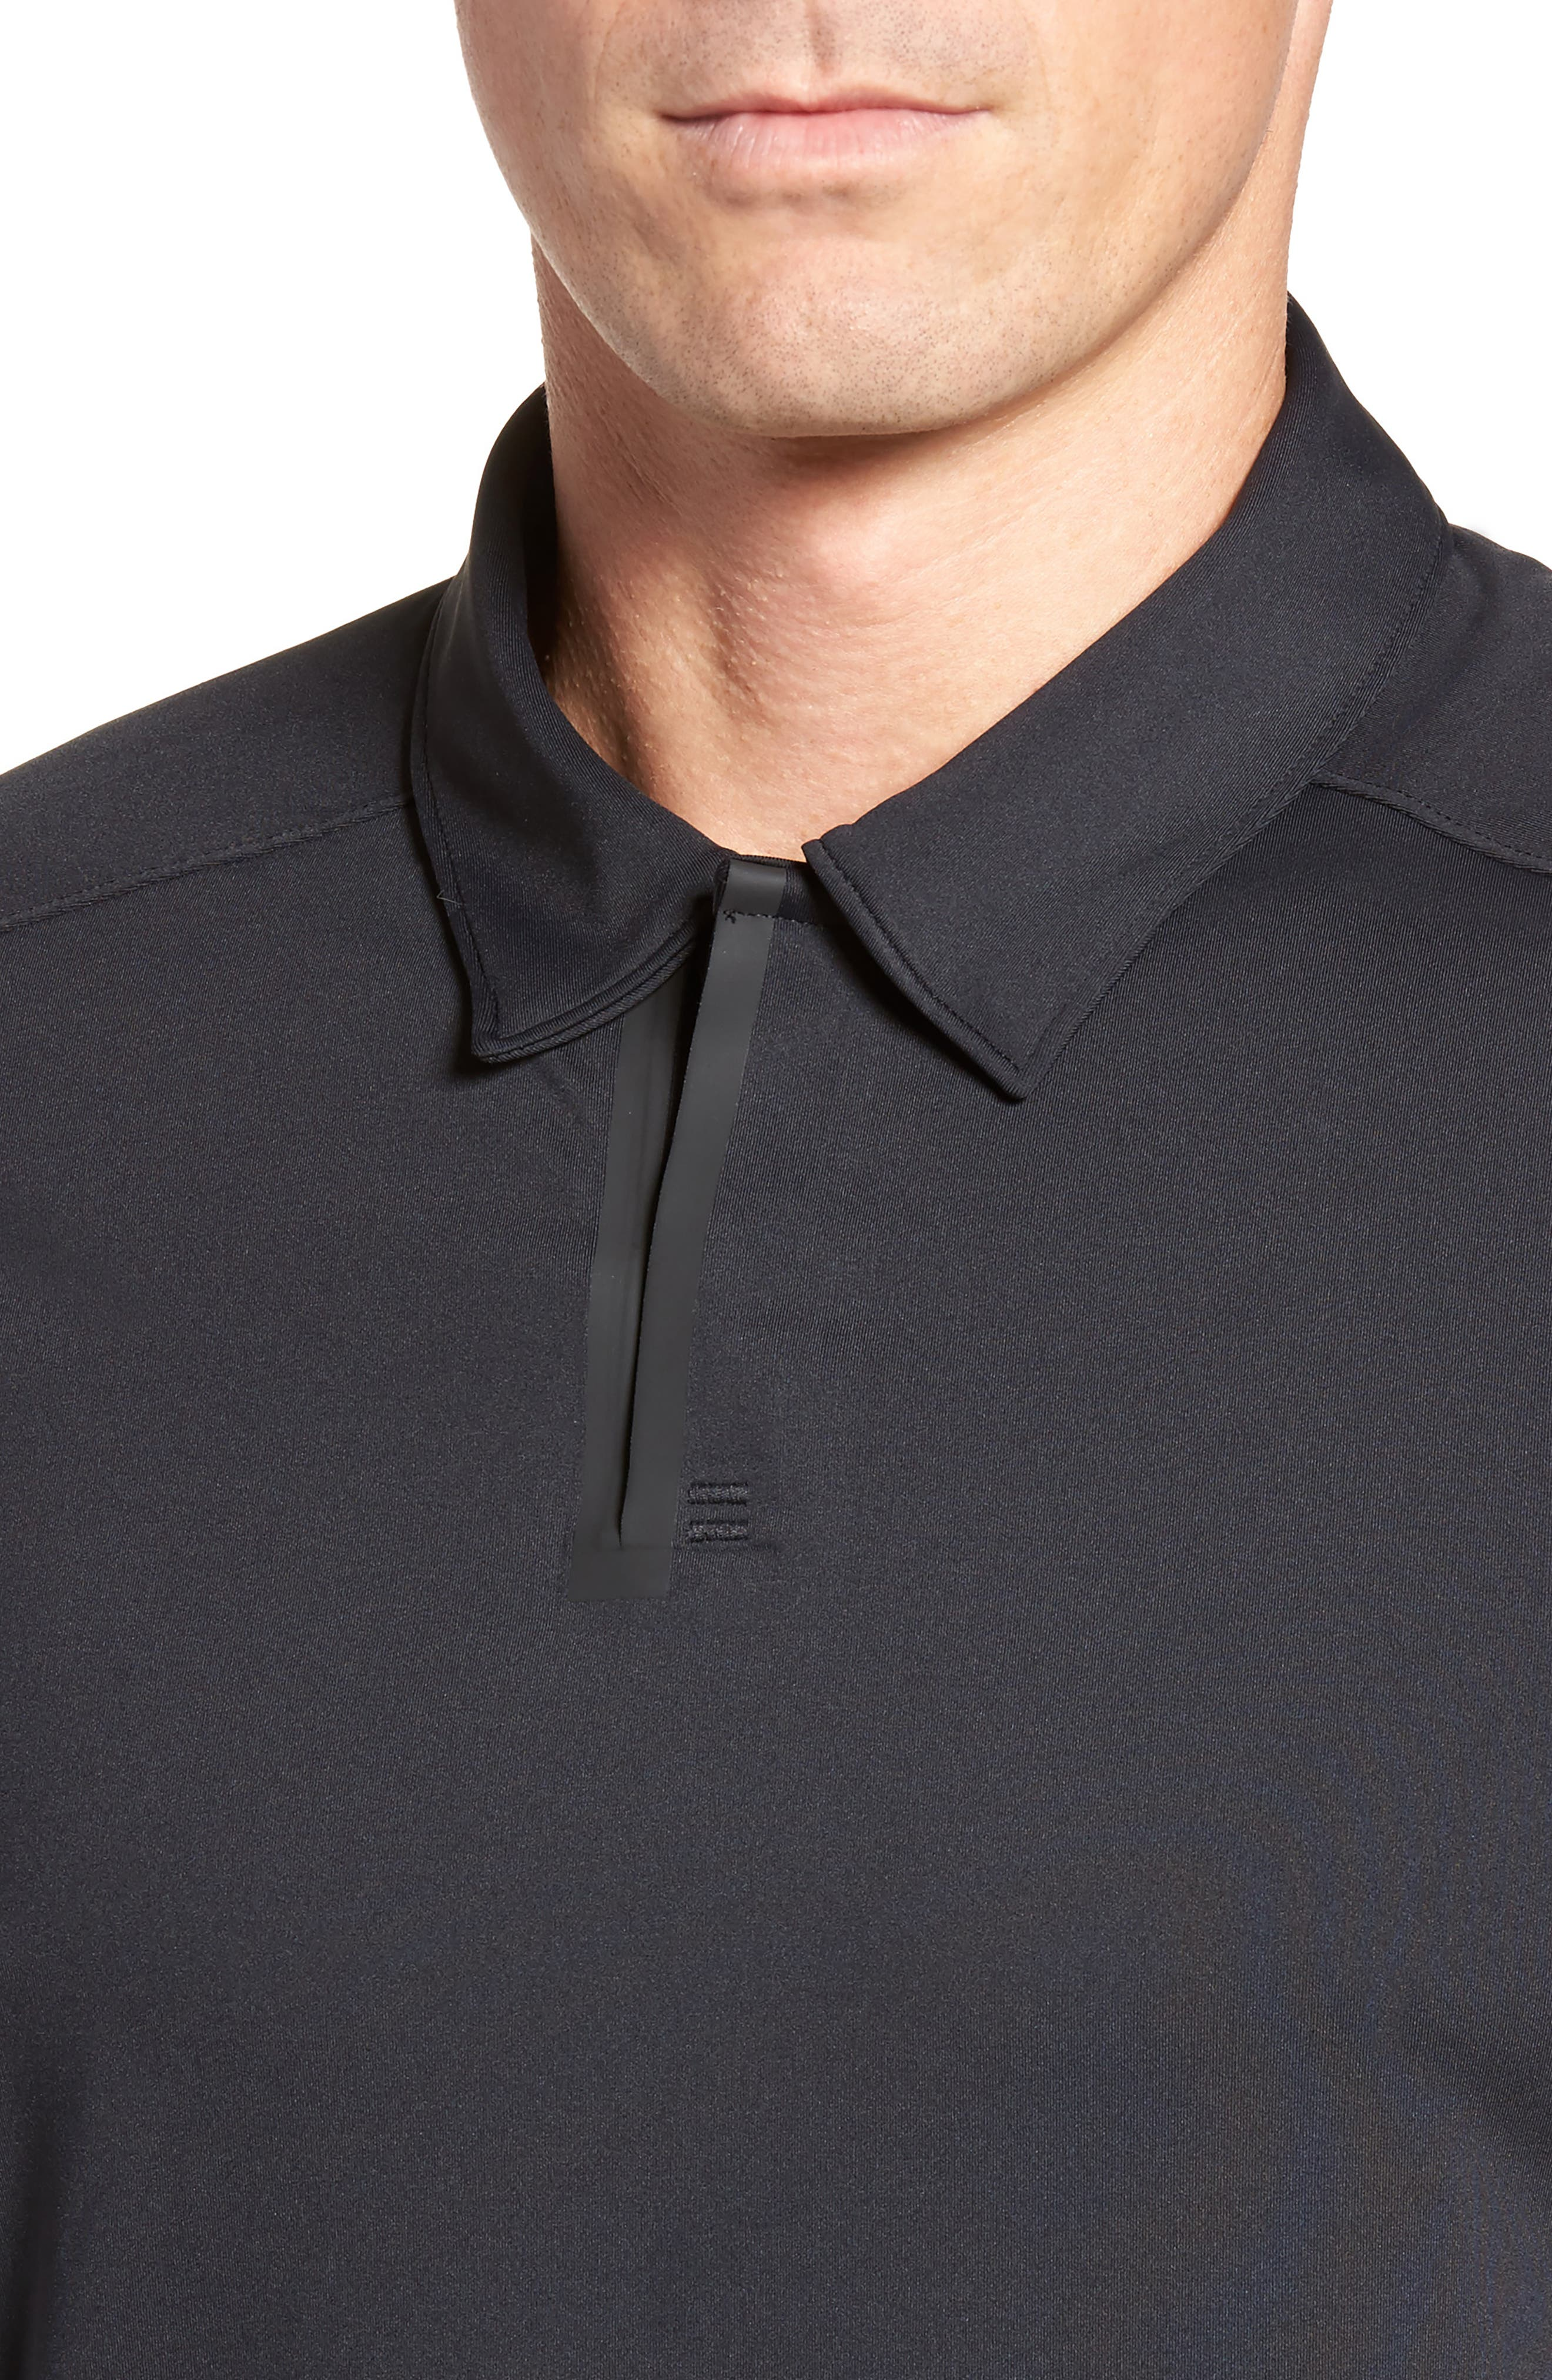 Velocity Polo Shirt,                             Alternate thumbnail 4, color,                             001